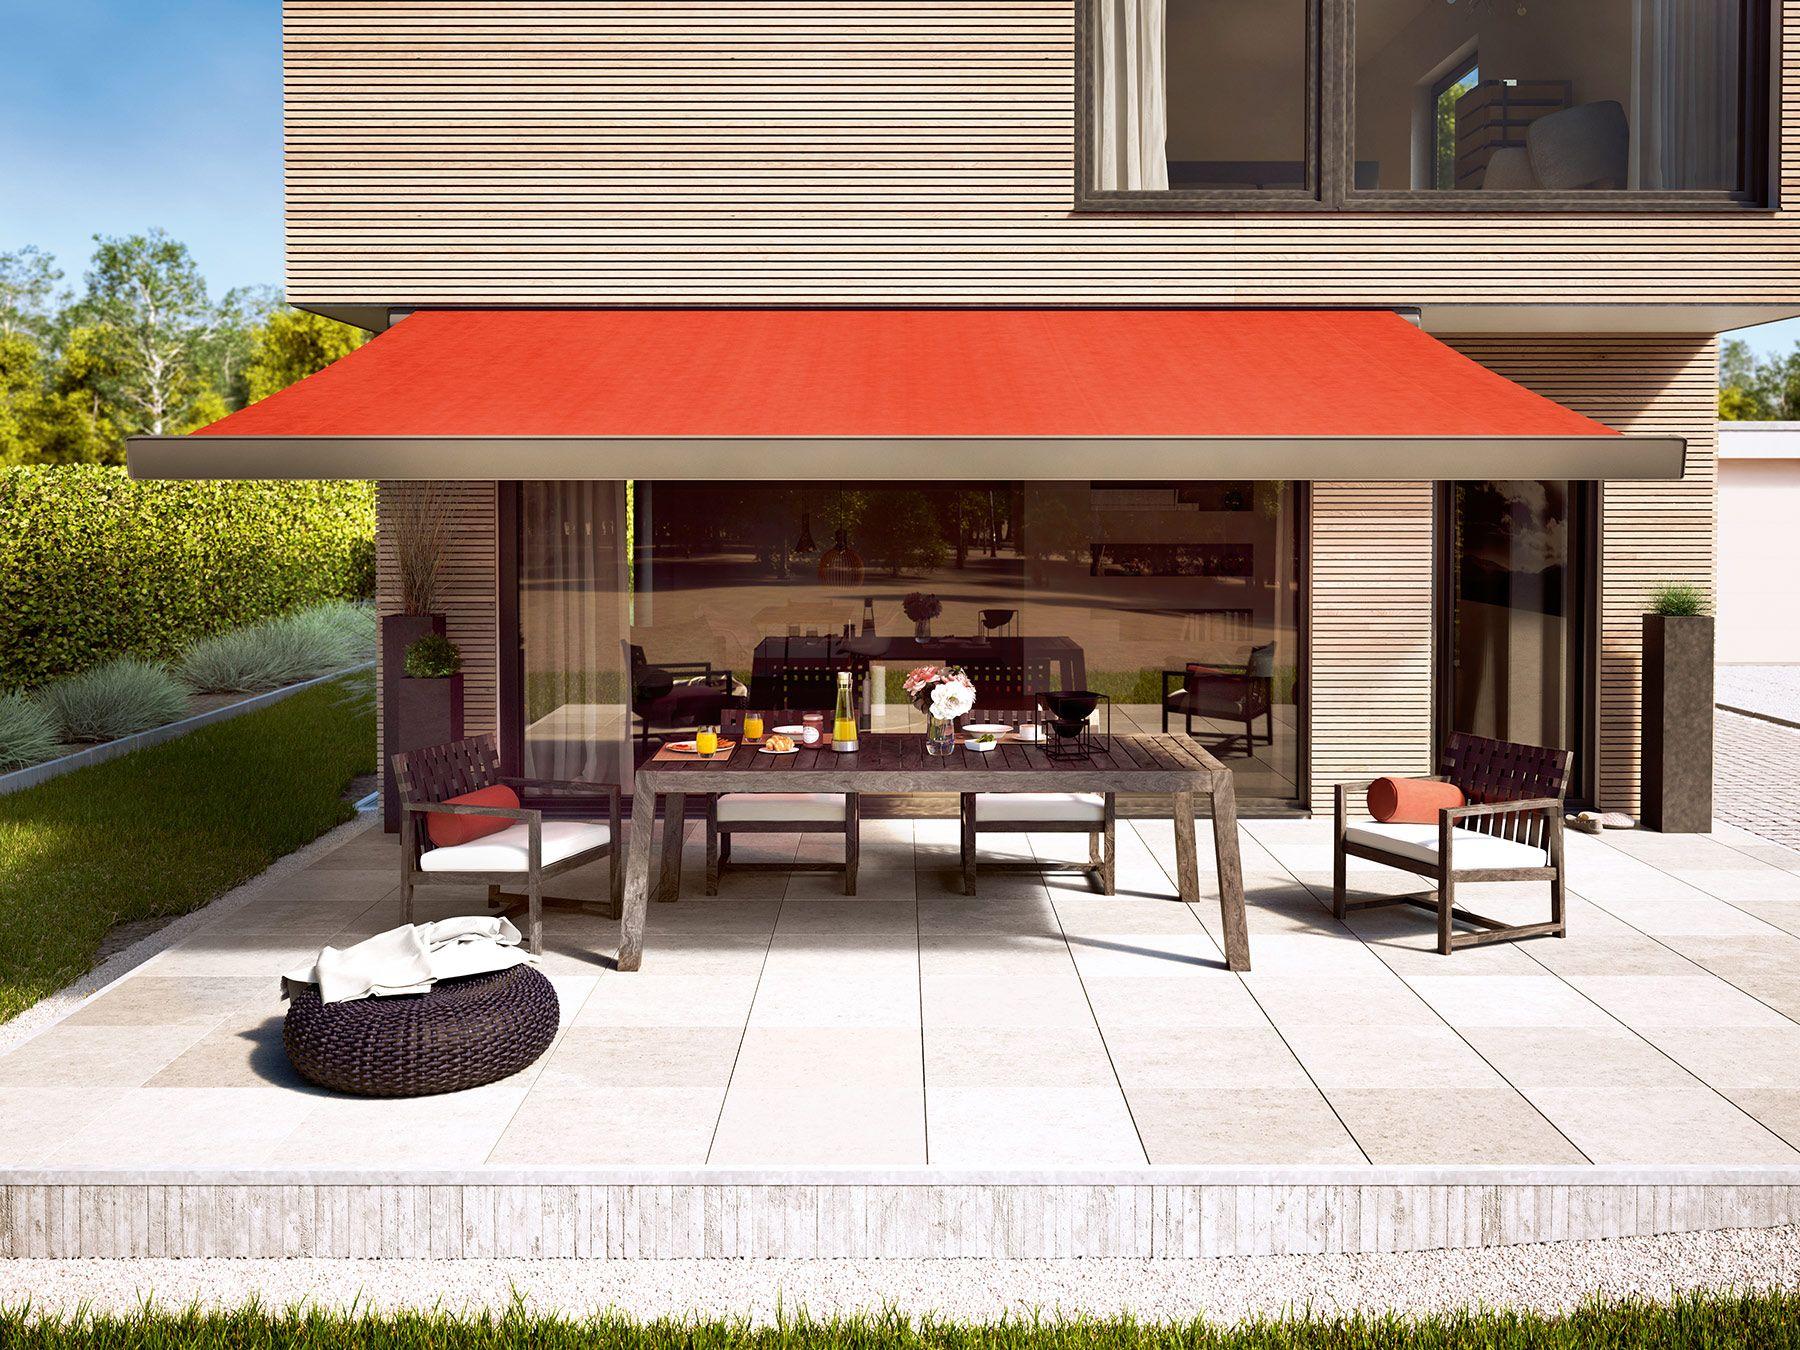 7 tipps so kommt der fr hling auf die terrasse fr hling auf der terrasse markise terrasse. Black Bedroom Furniture Sets. Home Design Ideas